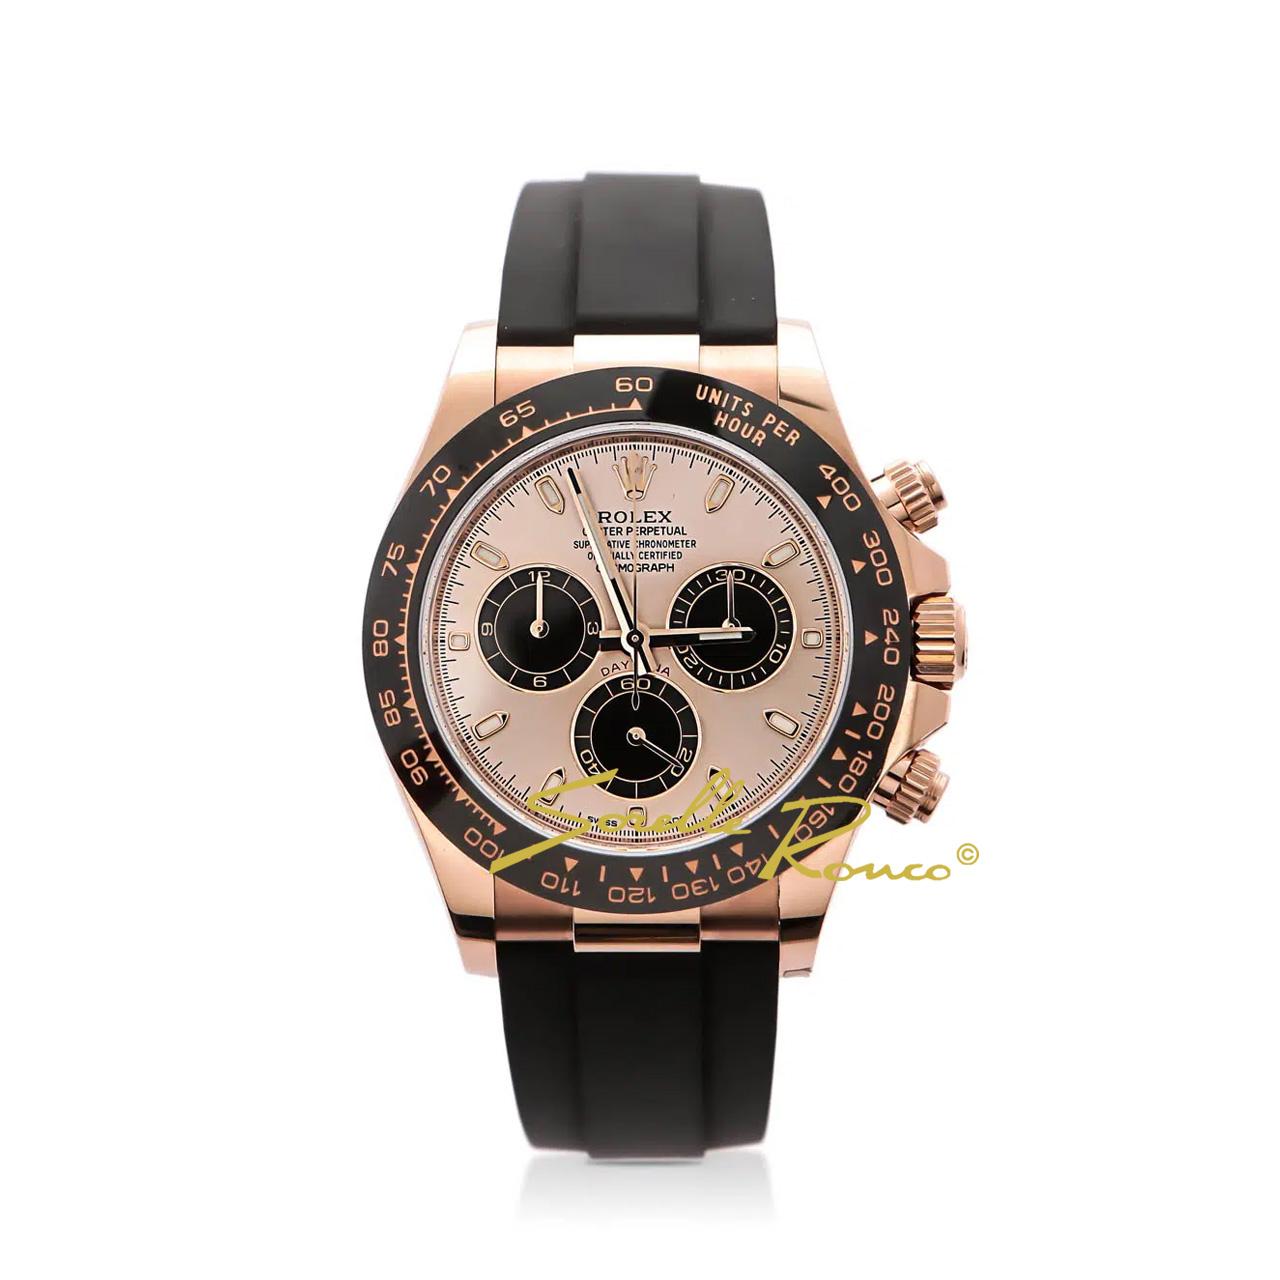 https://www.sorelleronco.it/Occasioni/schede_orologi/Rolex/wcr2280-ROLEX-Daytona-Everose-Oysterflex/Rolex-Daytona-116515LN.jpg